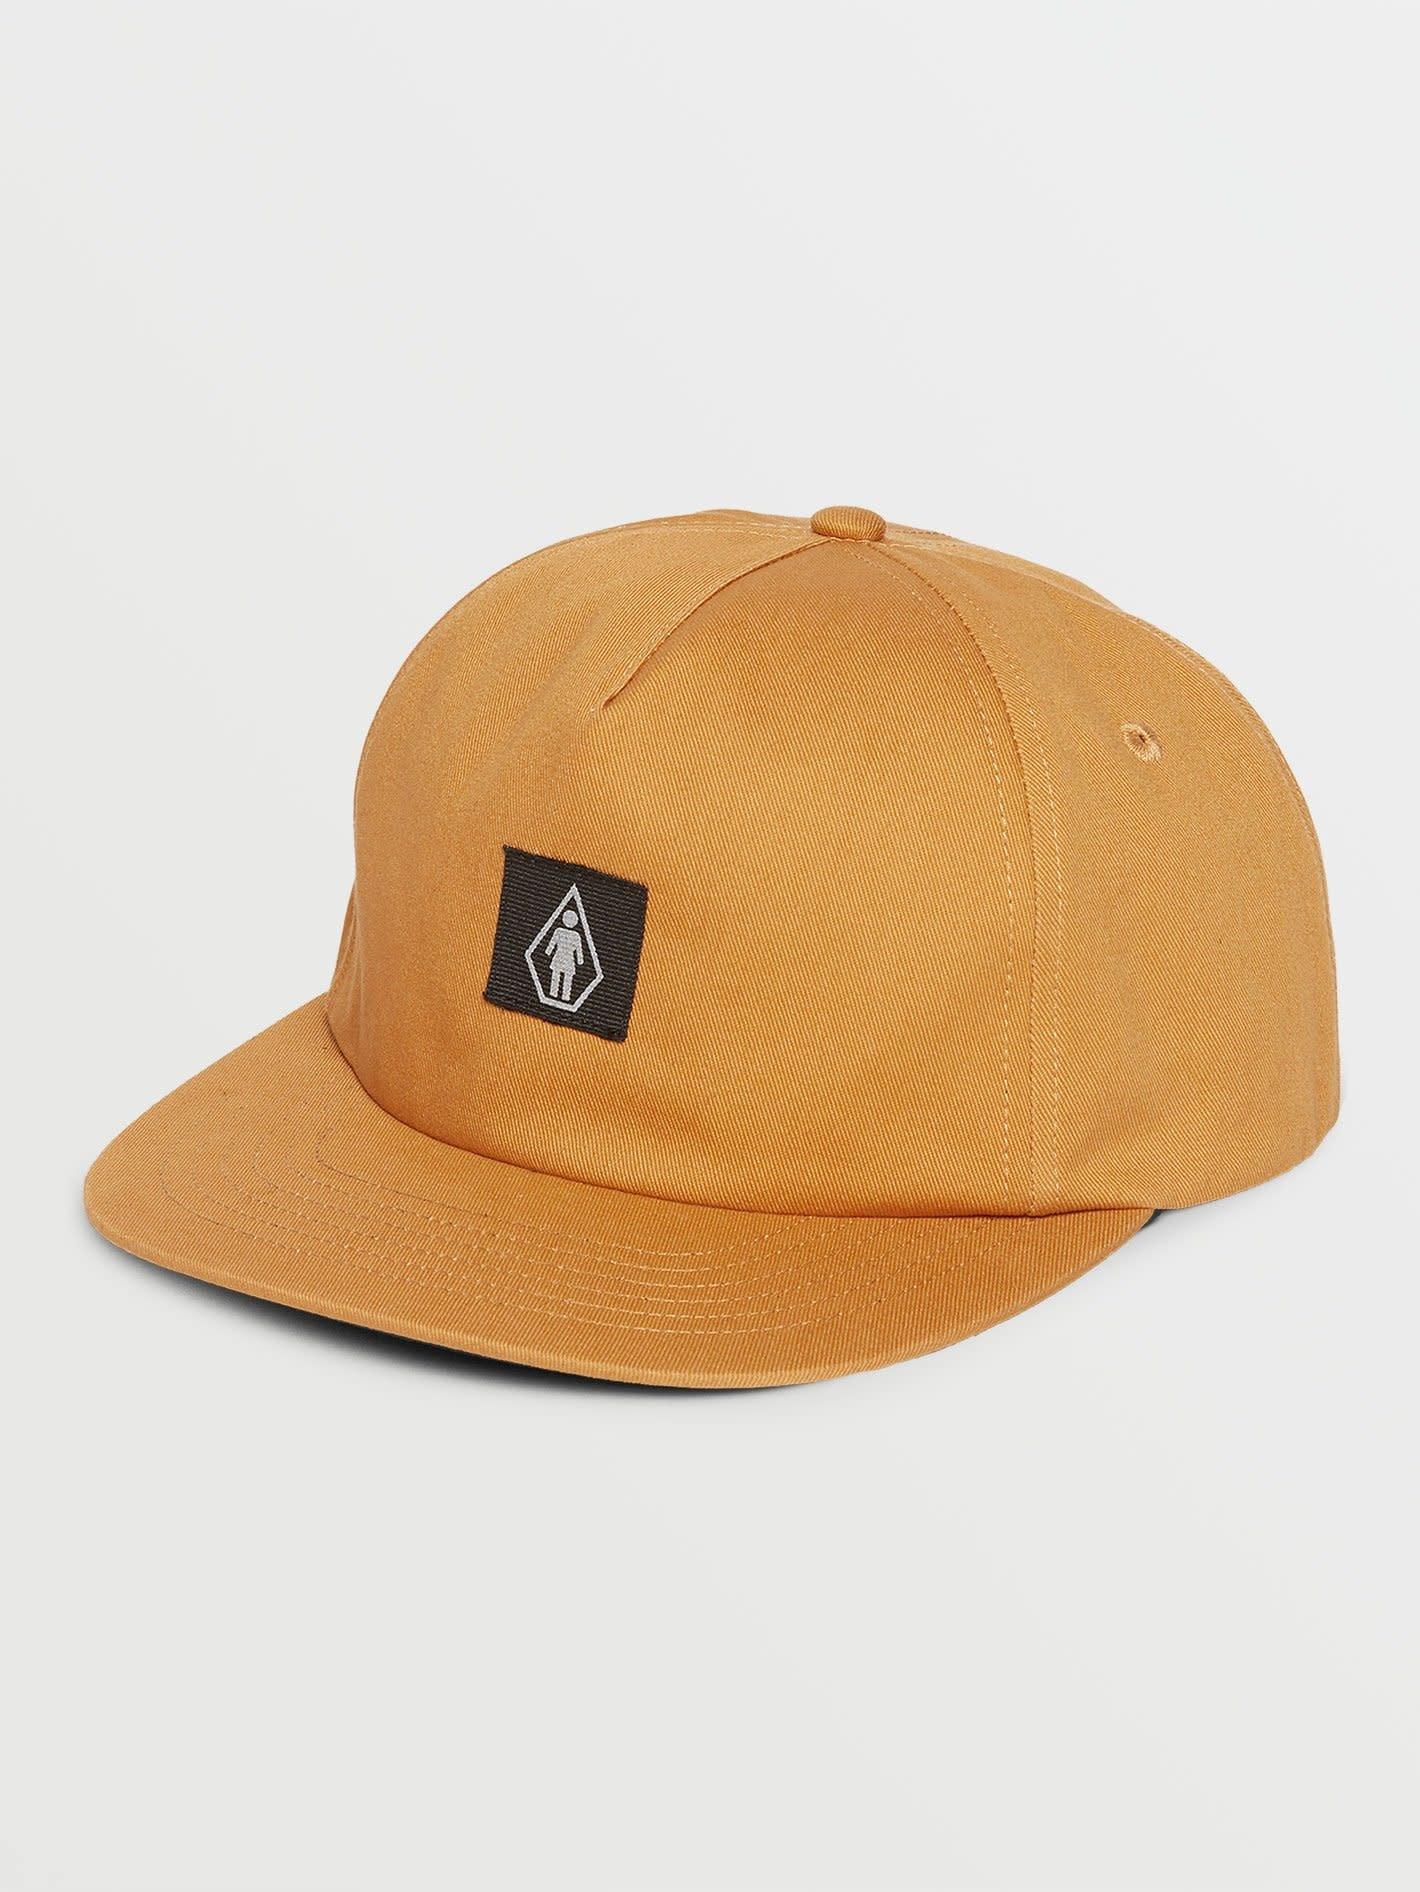 Volcom x Girl Hat - Sand